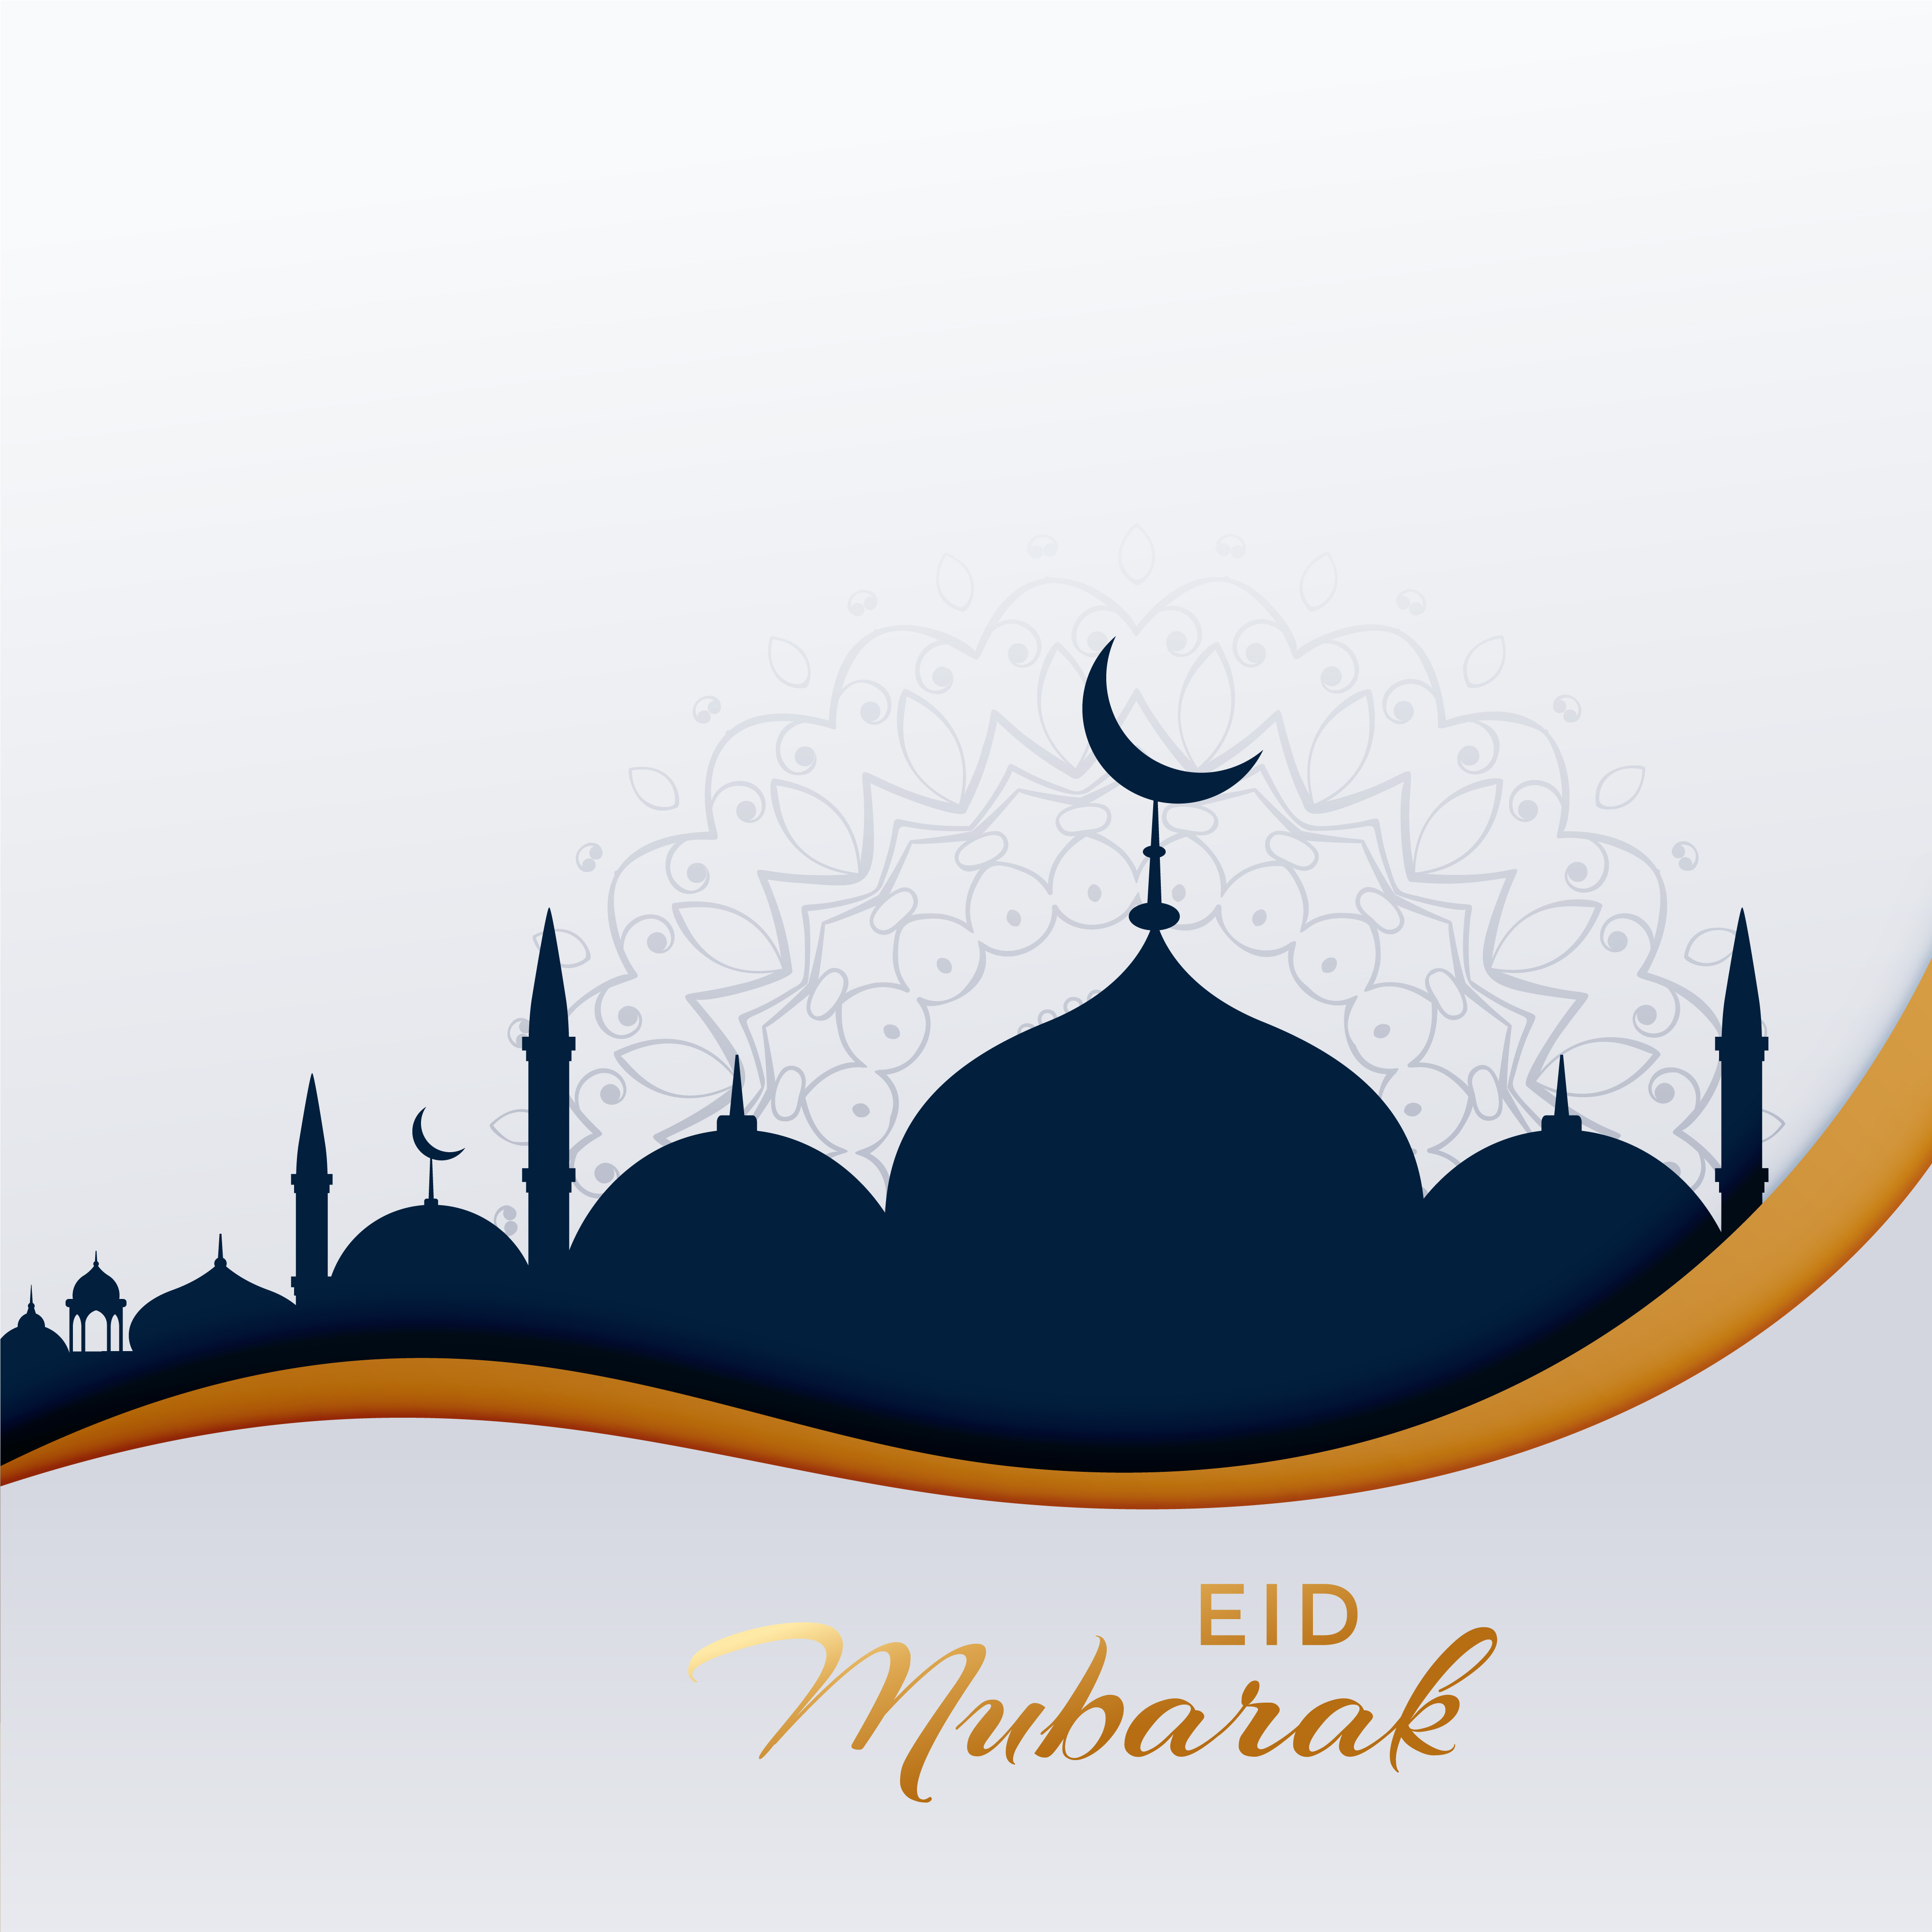 eid mubarak islamic greeting with mosque - Download Free ...